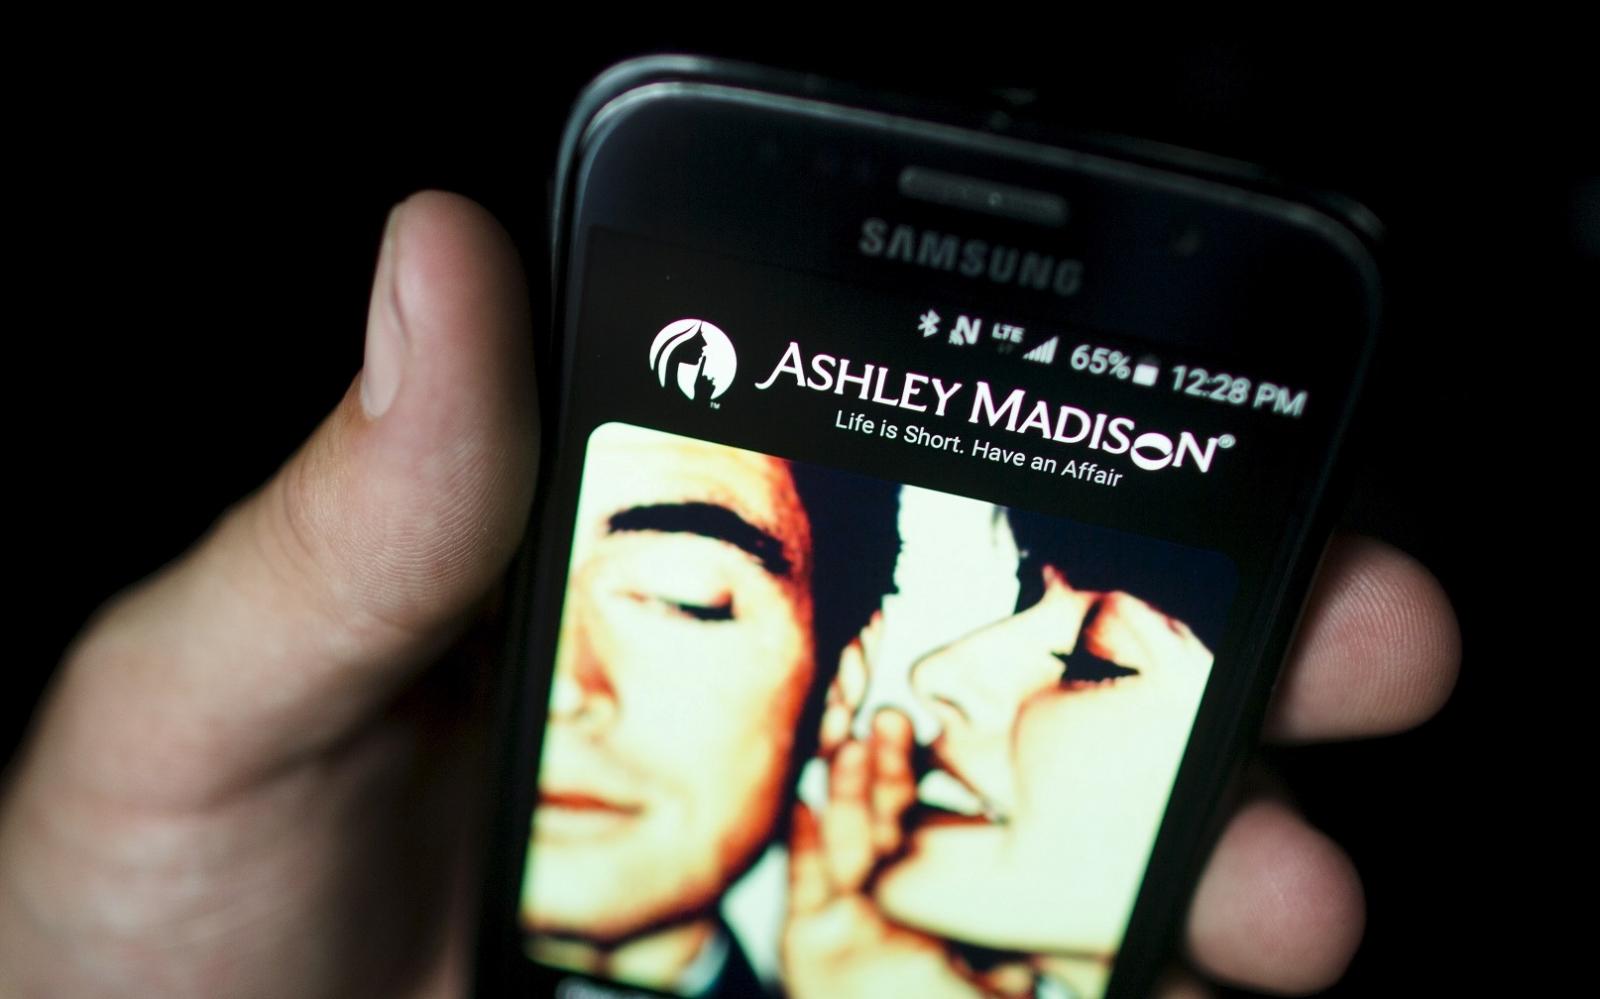 ashley madison hack list blackmail